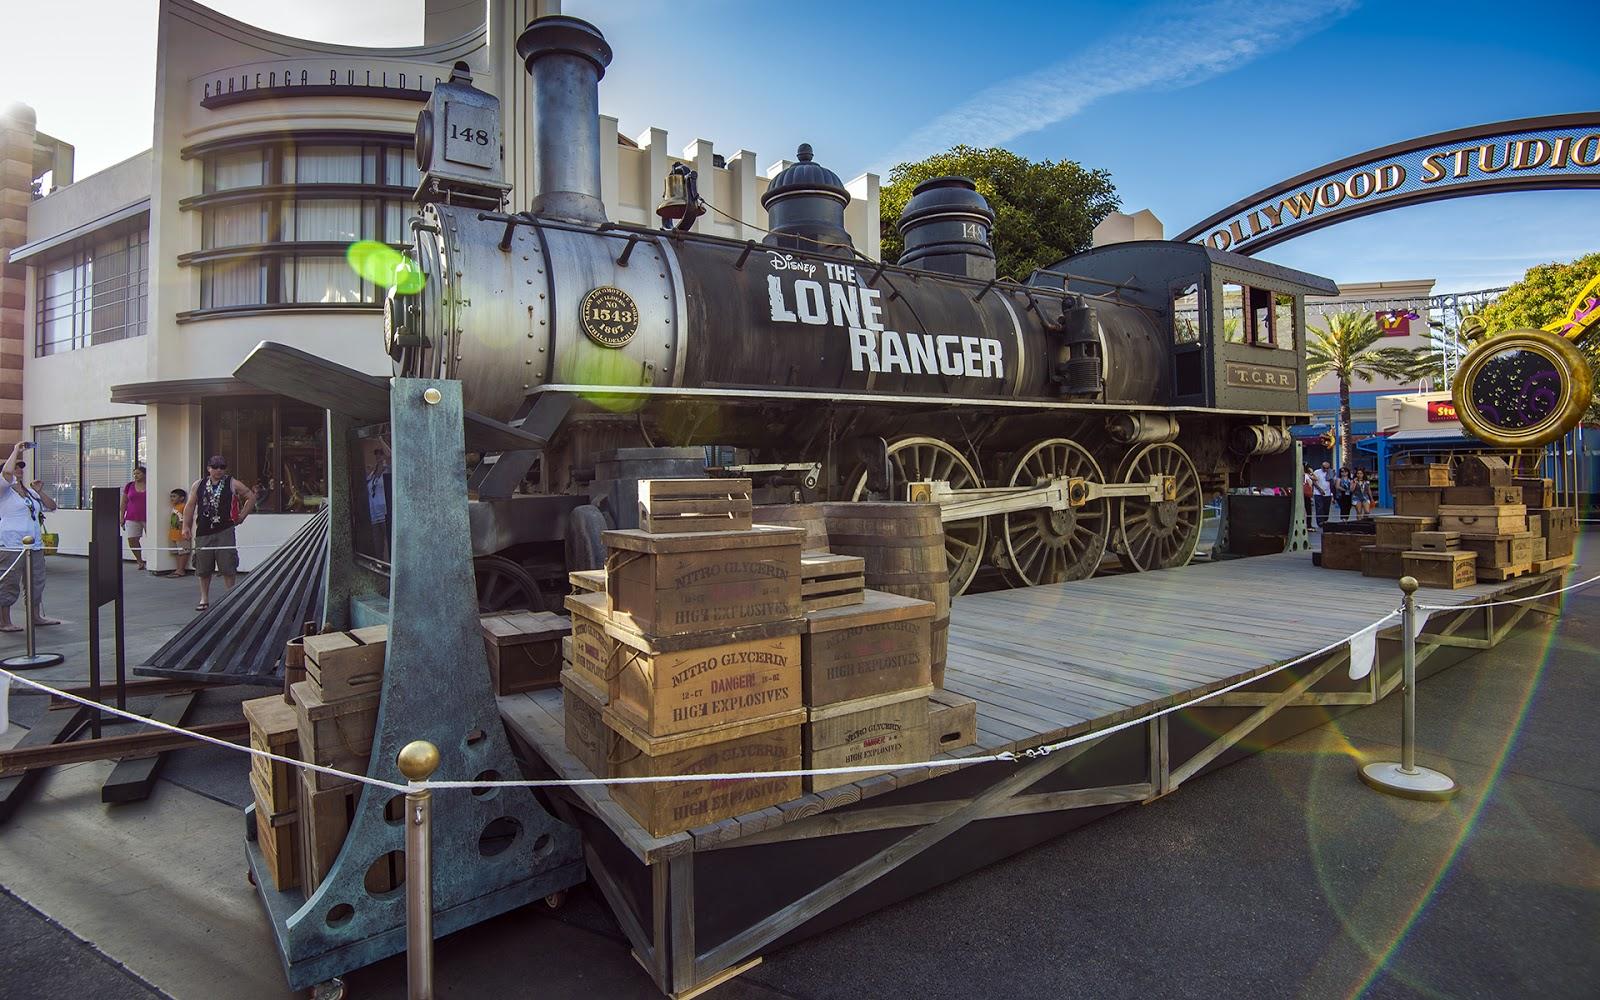 The Lone Ranger Train